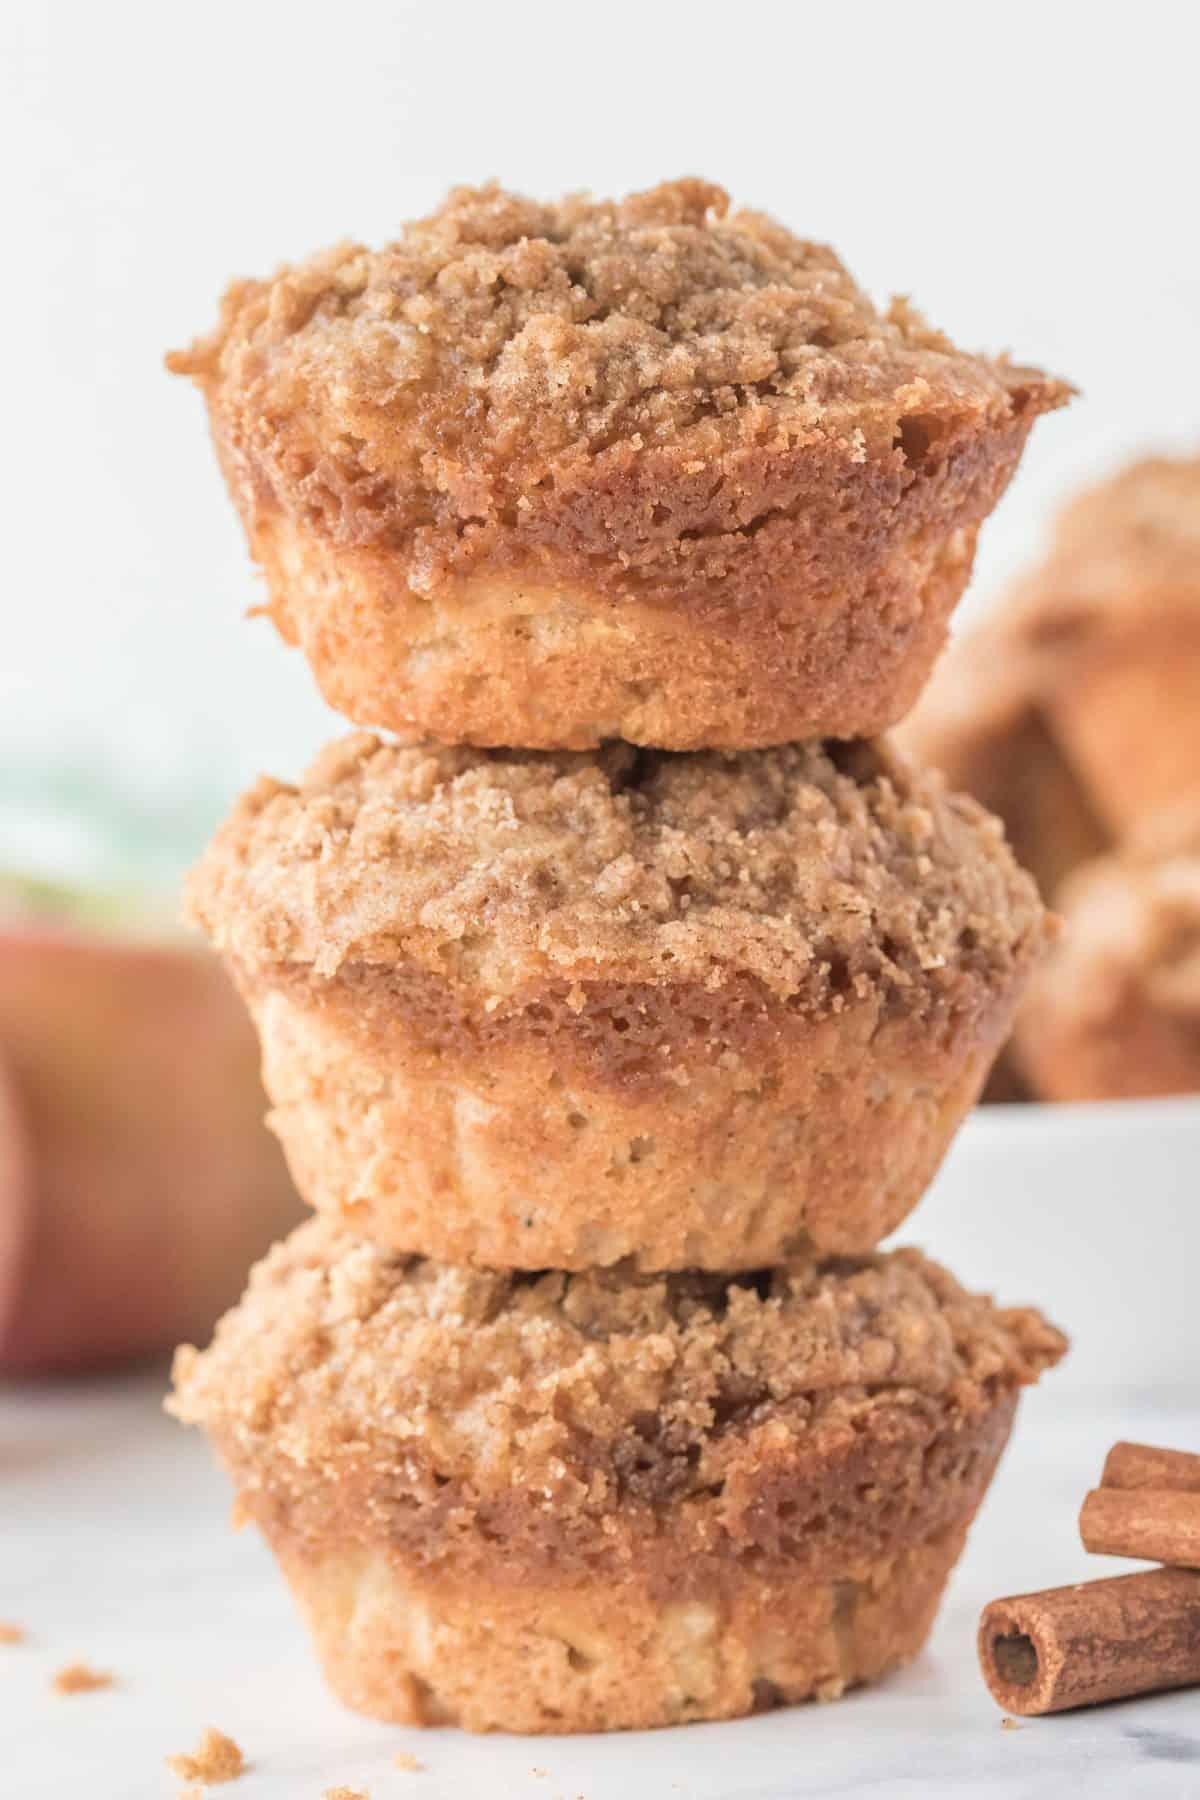 stack of three apple cinnamon muffins